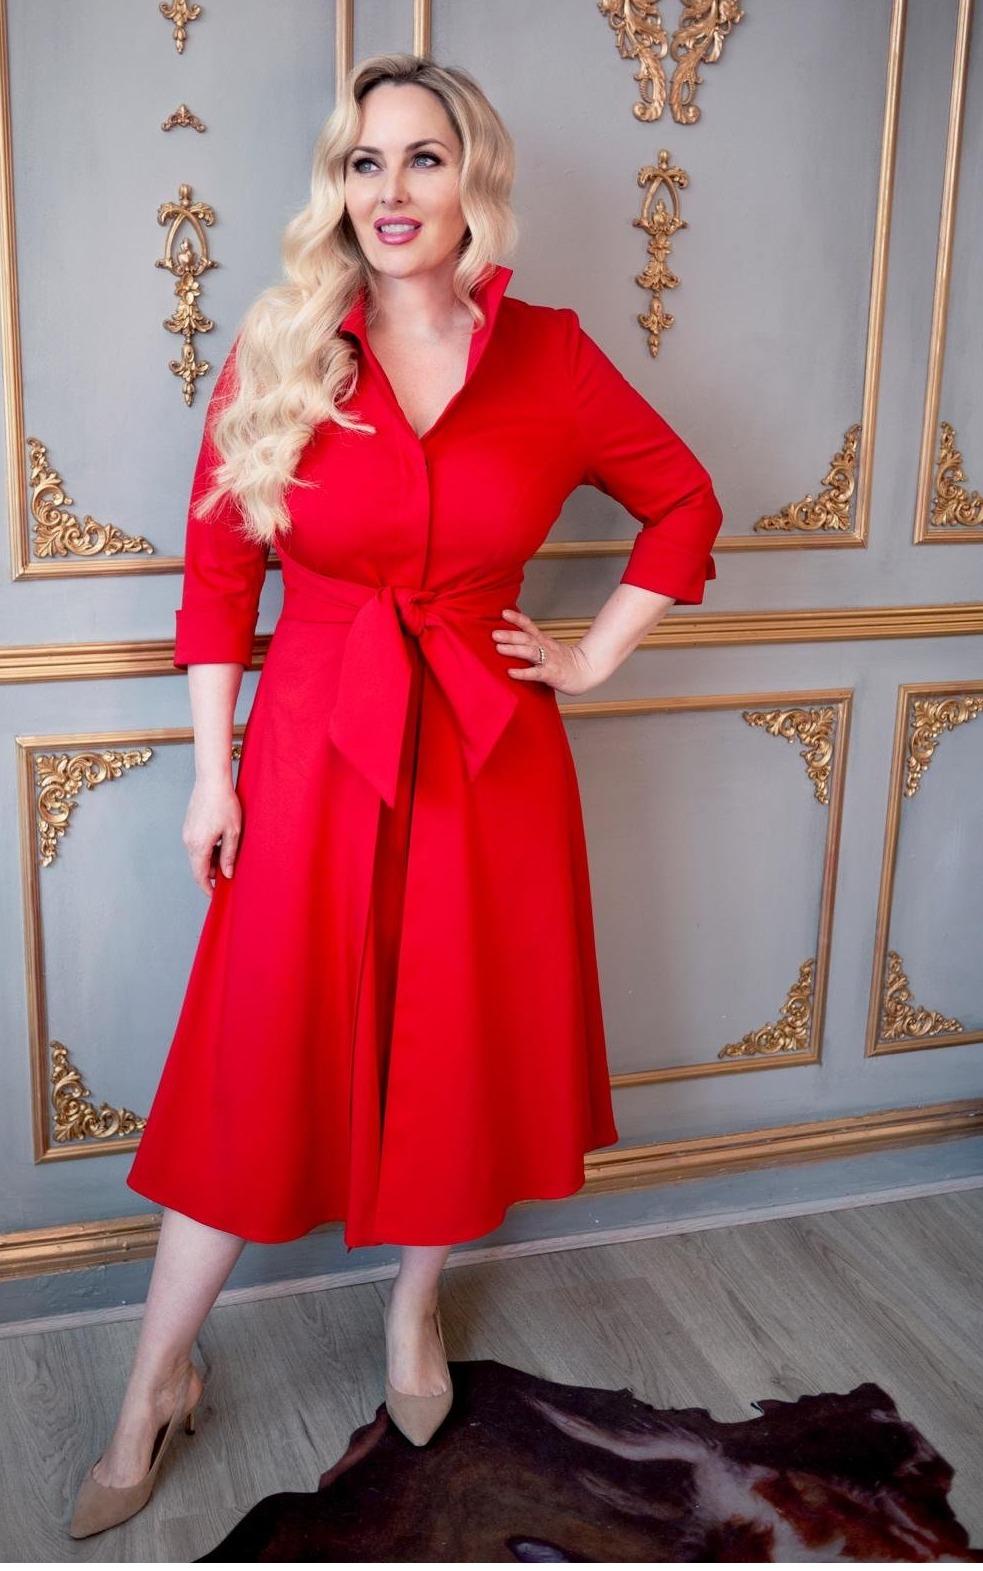 Grace Kelly style 50's dress in red below the knee